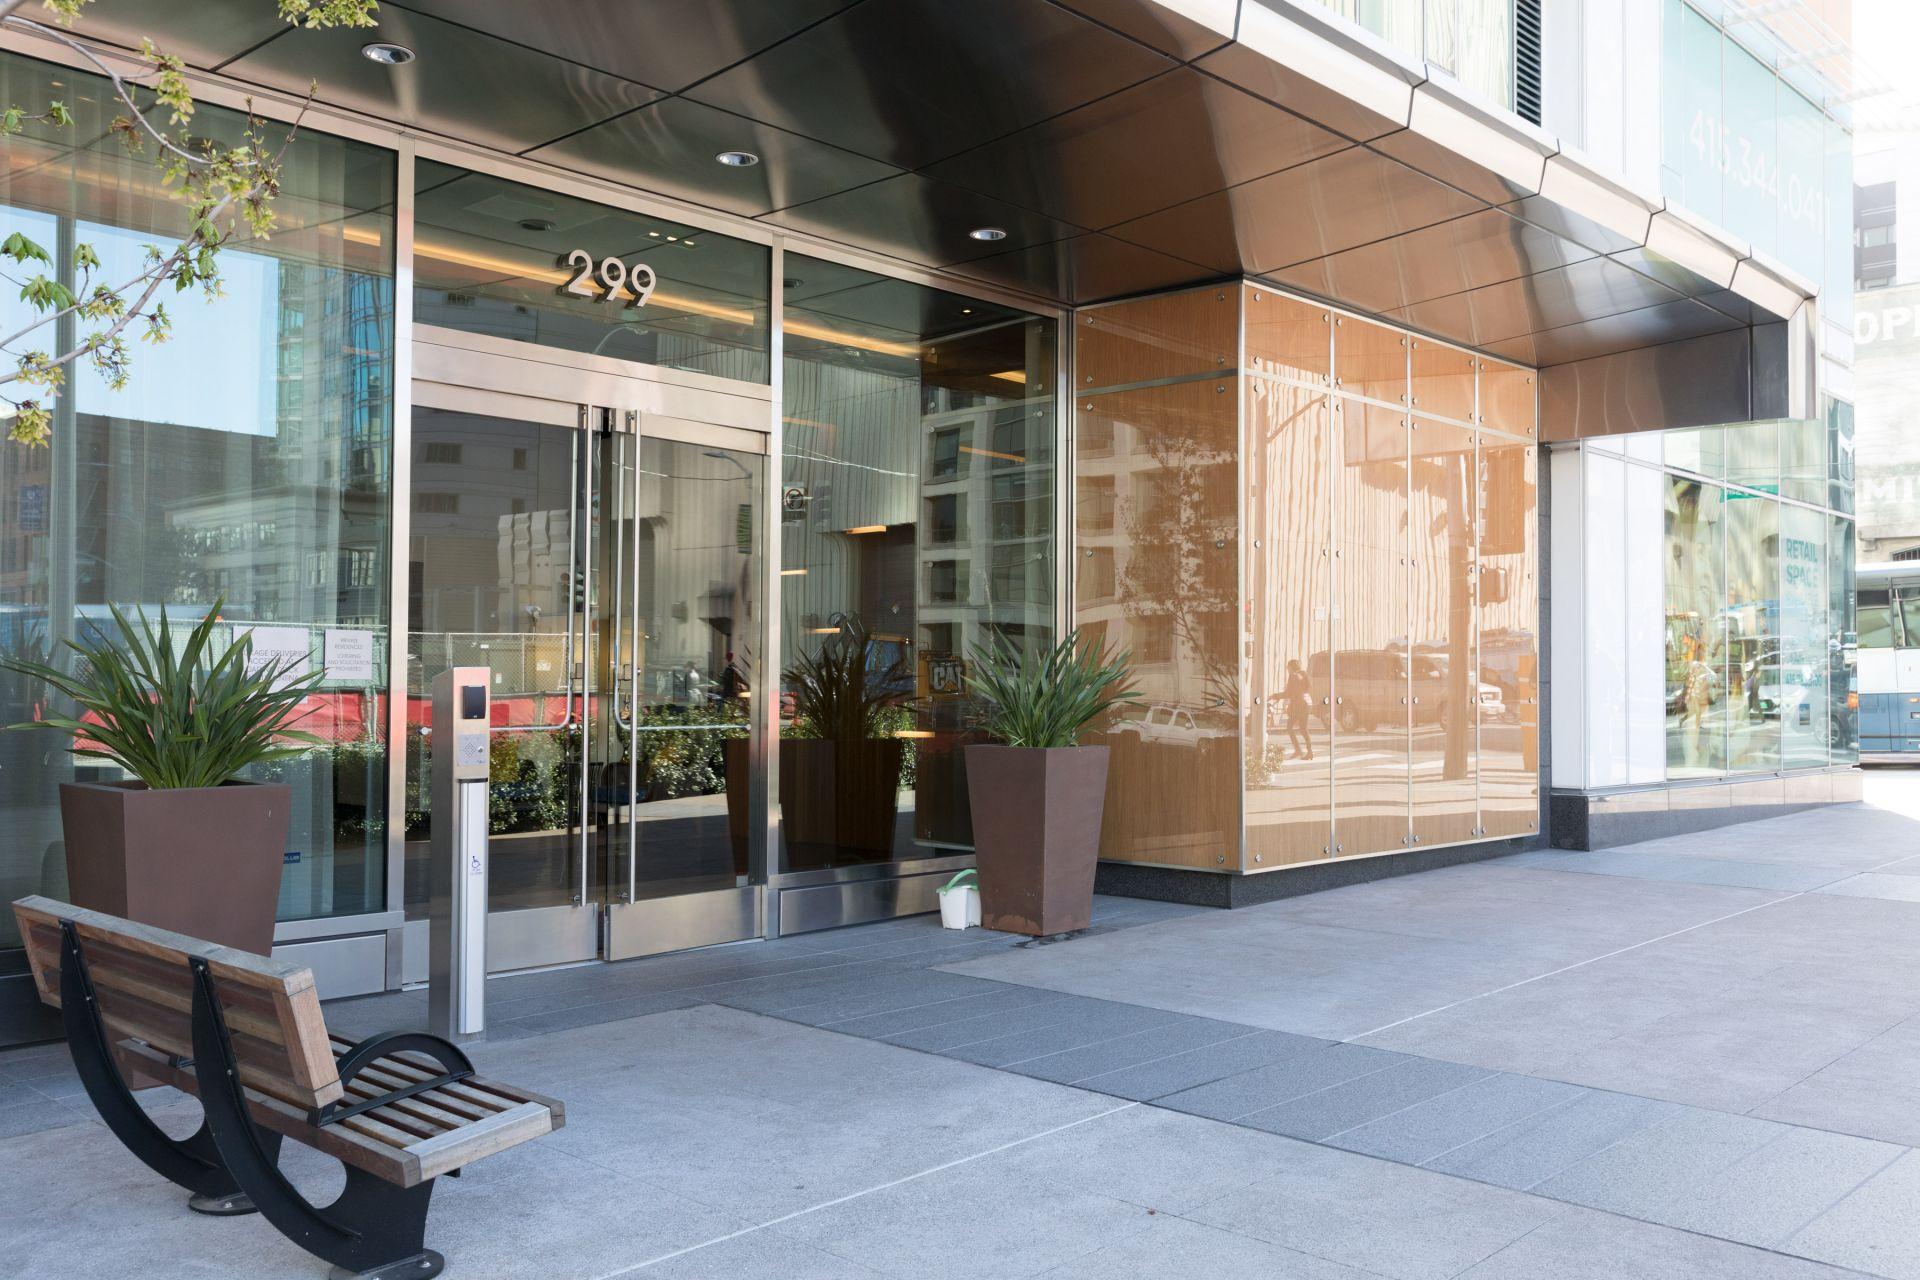 Exterior office Modular Exterior Office Entrance Modlarcom Exterior Office Entrance Modlarcom